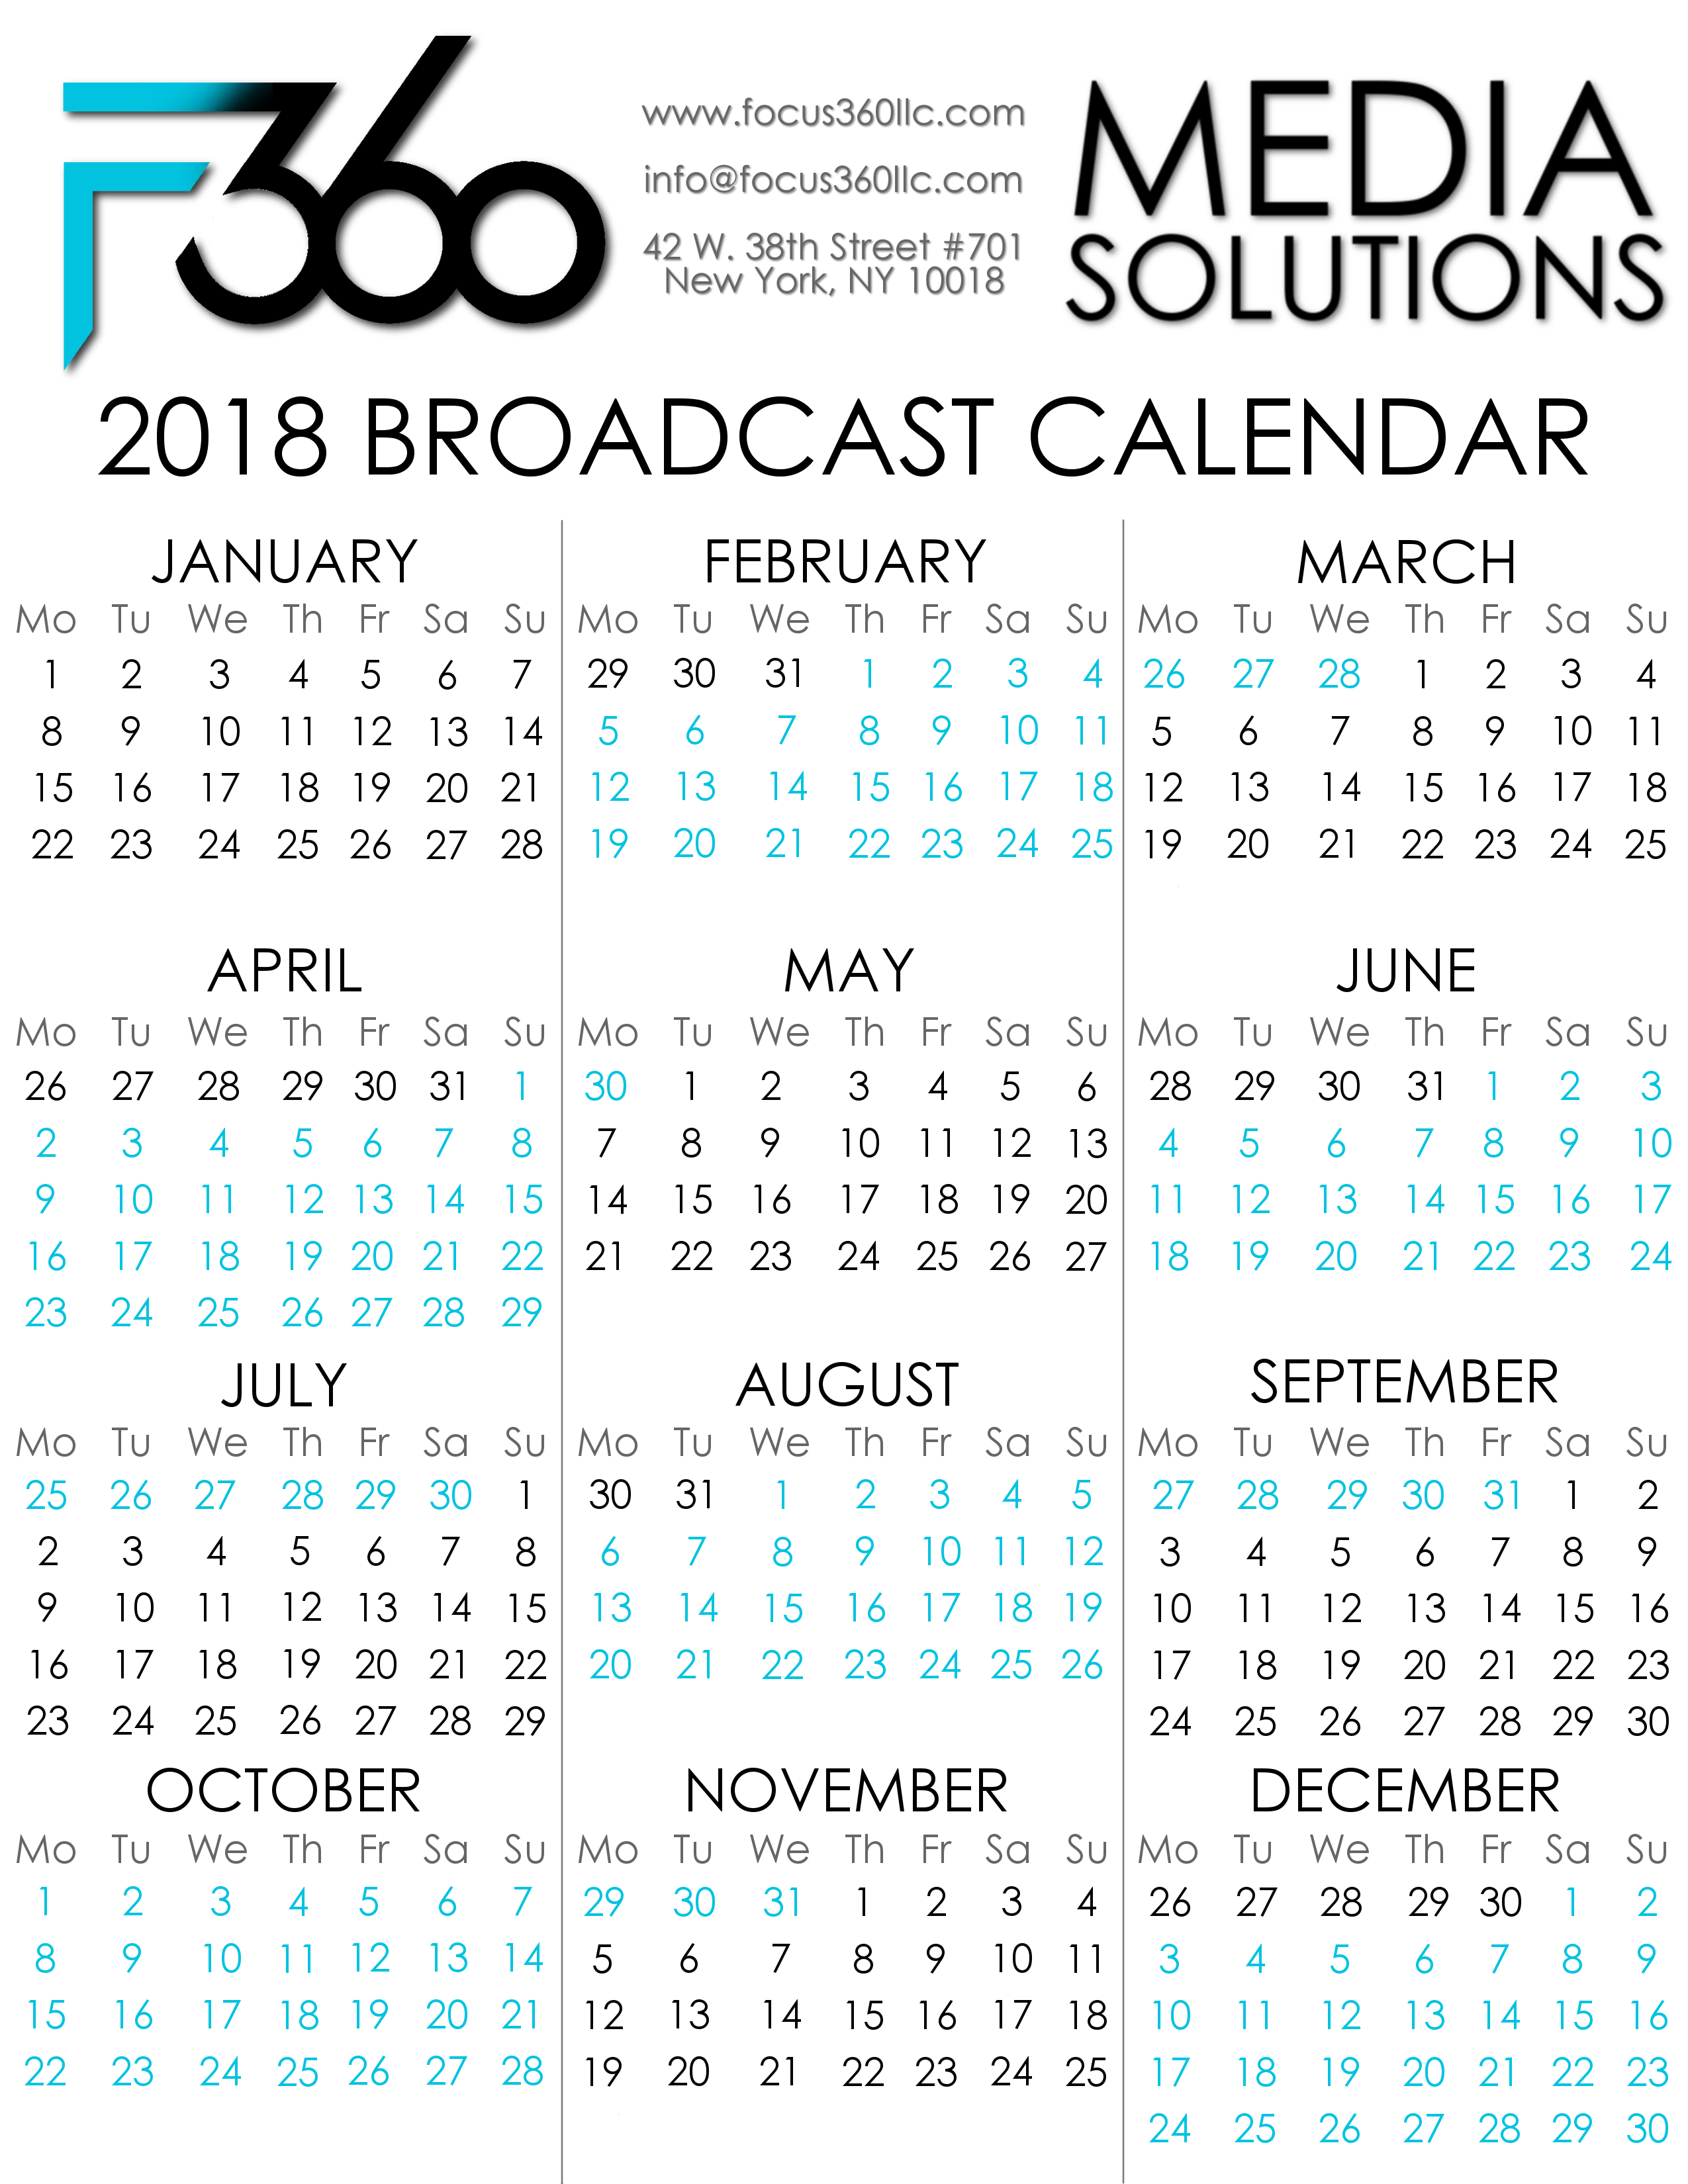 2018 focus 360 broadcast calendar focus360